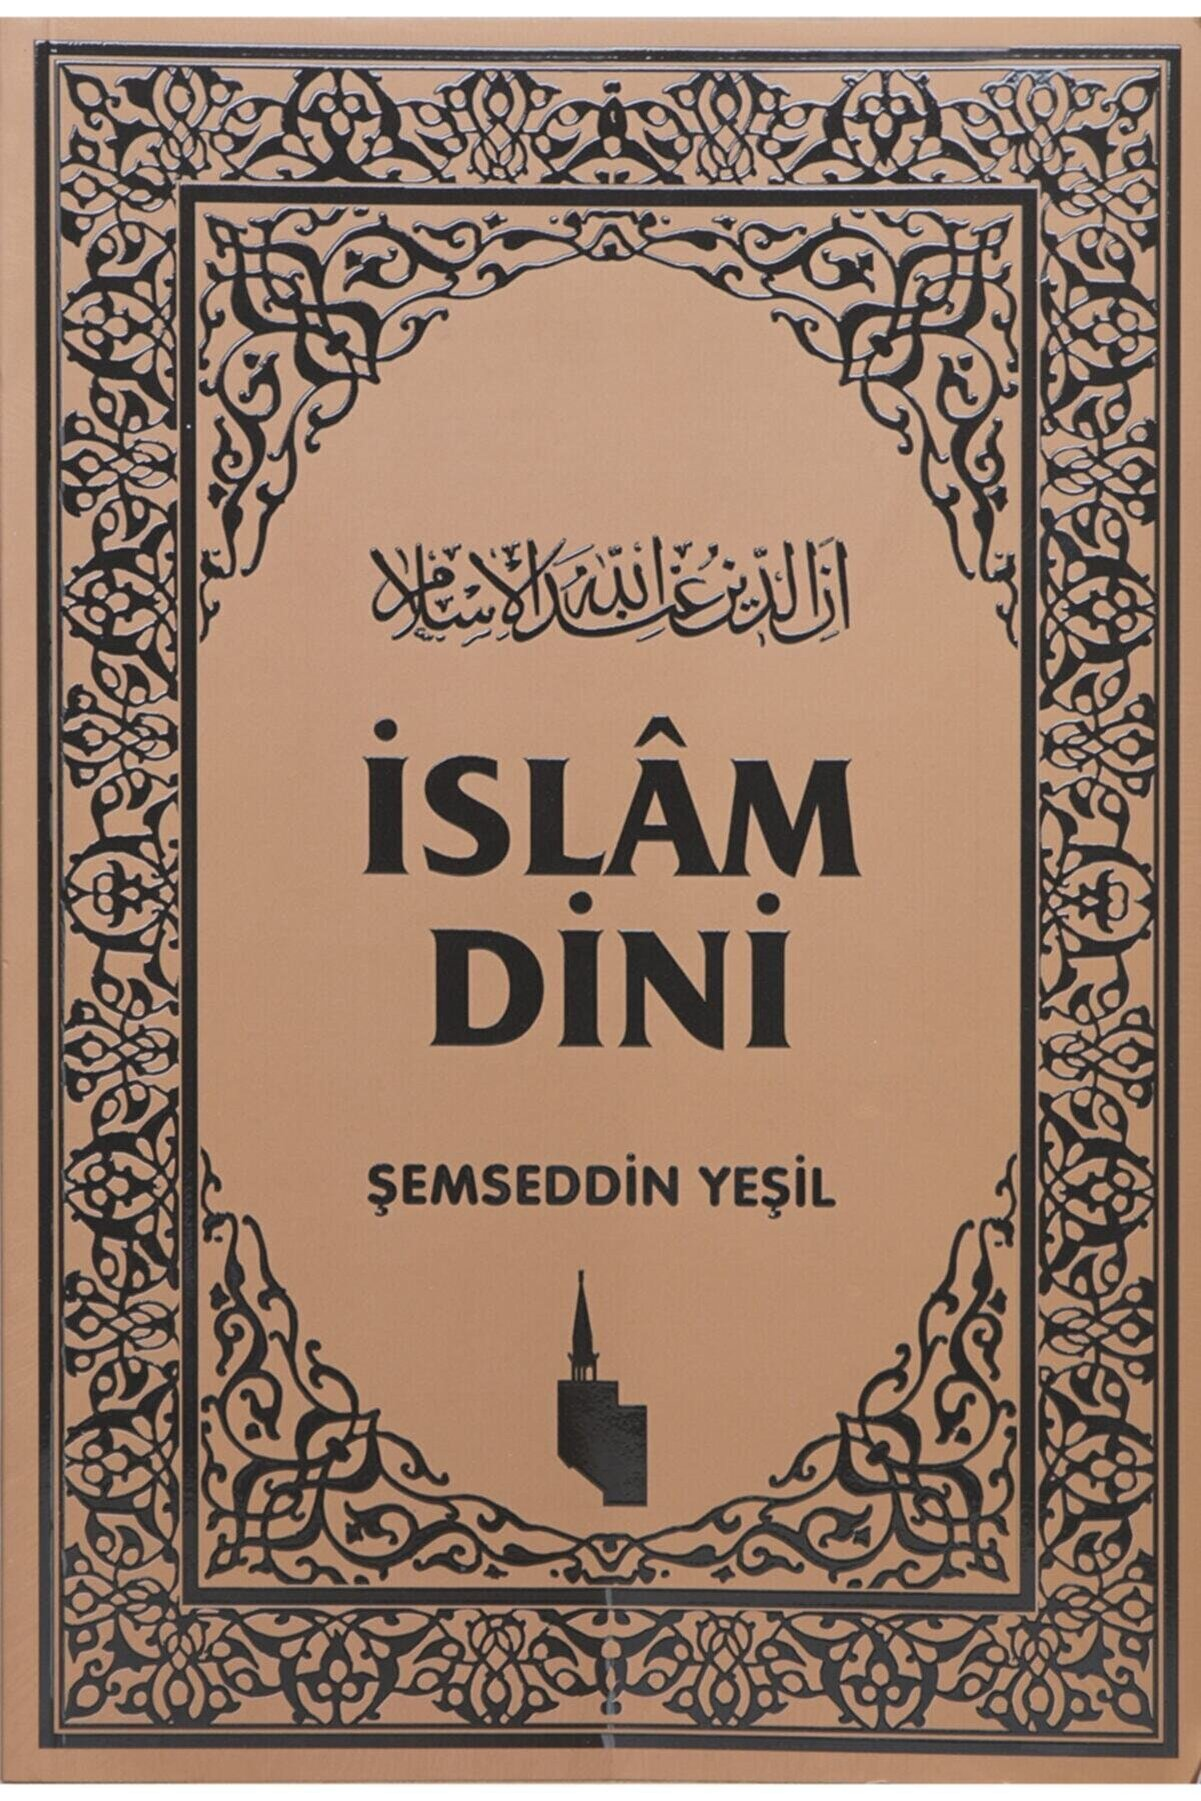 Şemseddin Yeşil Islam Dini